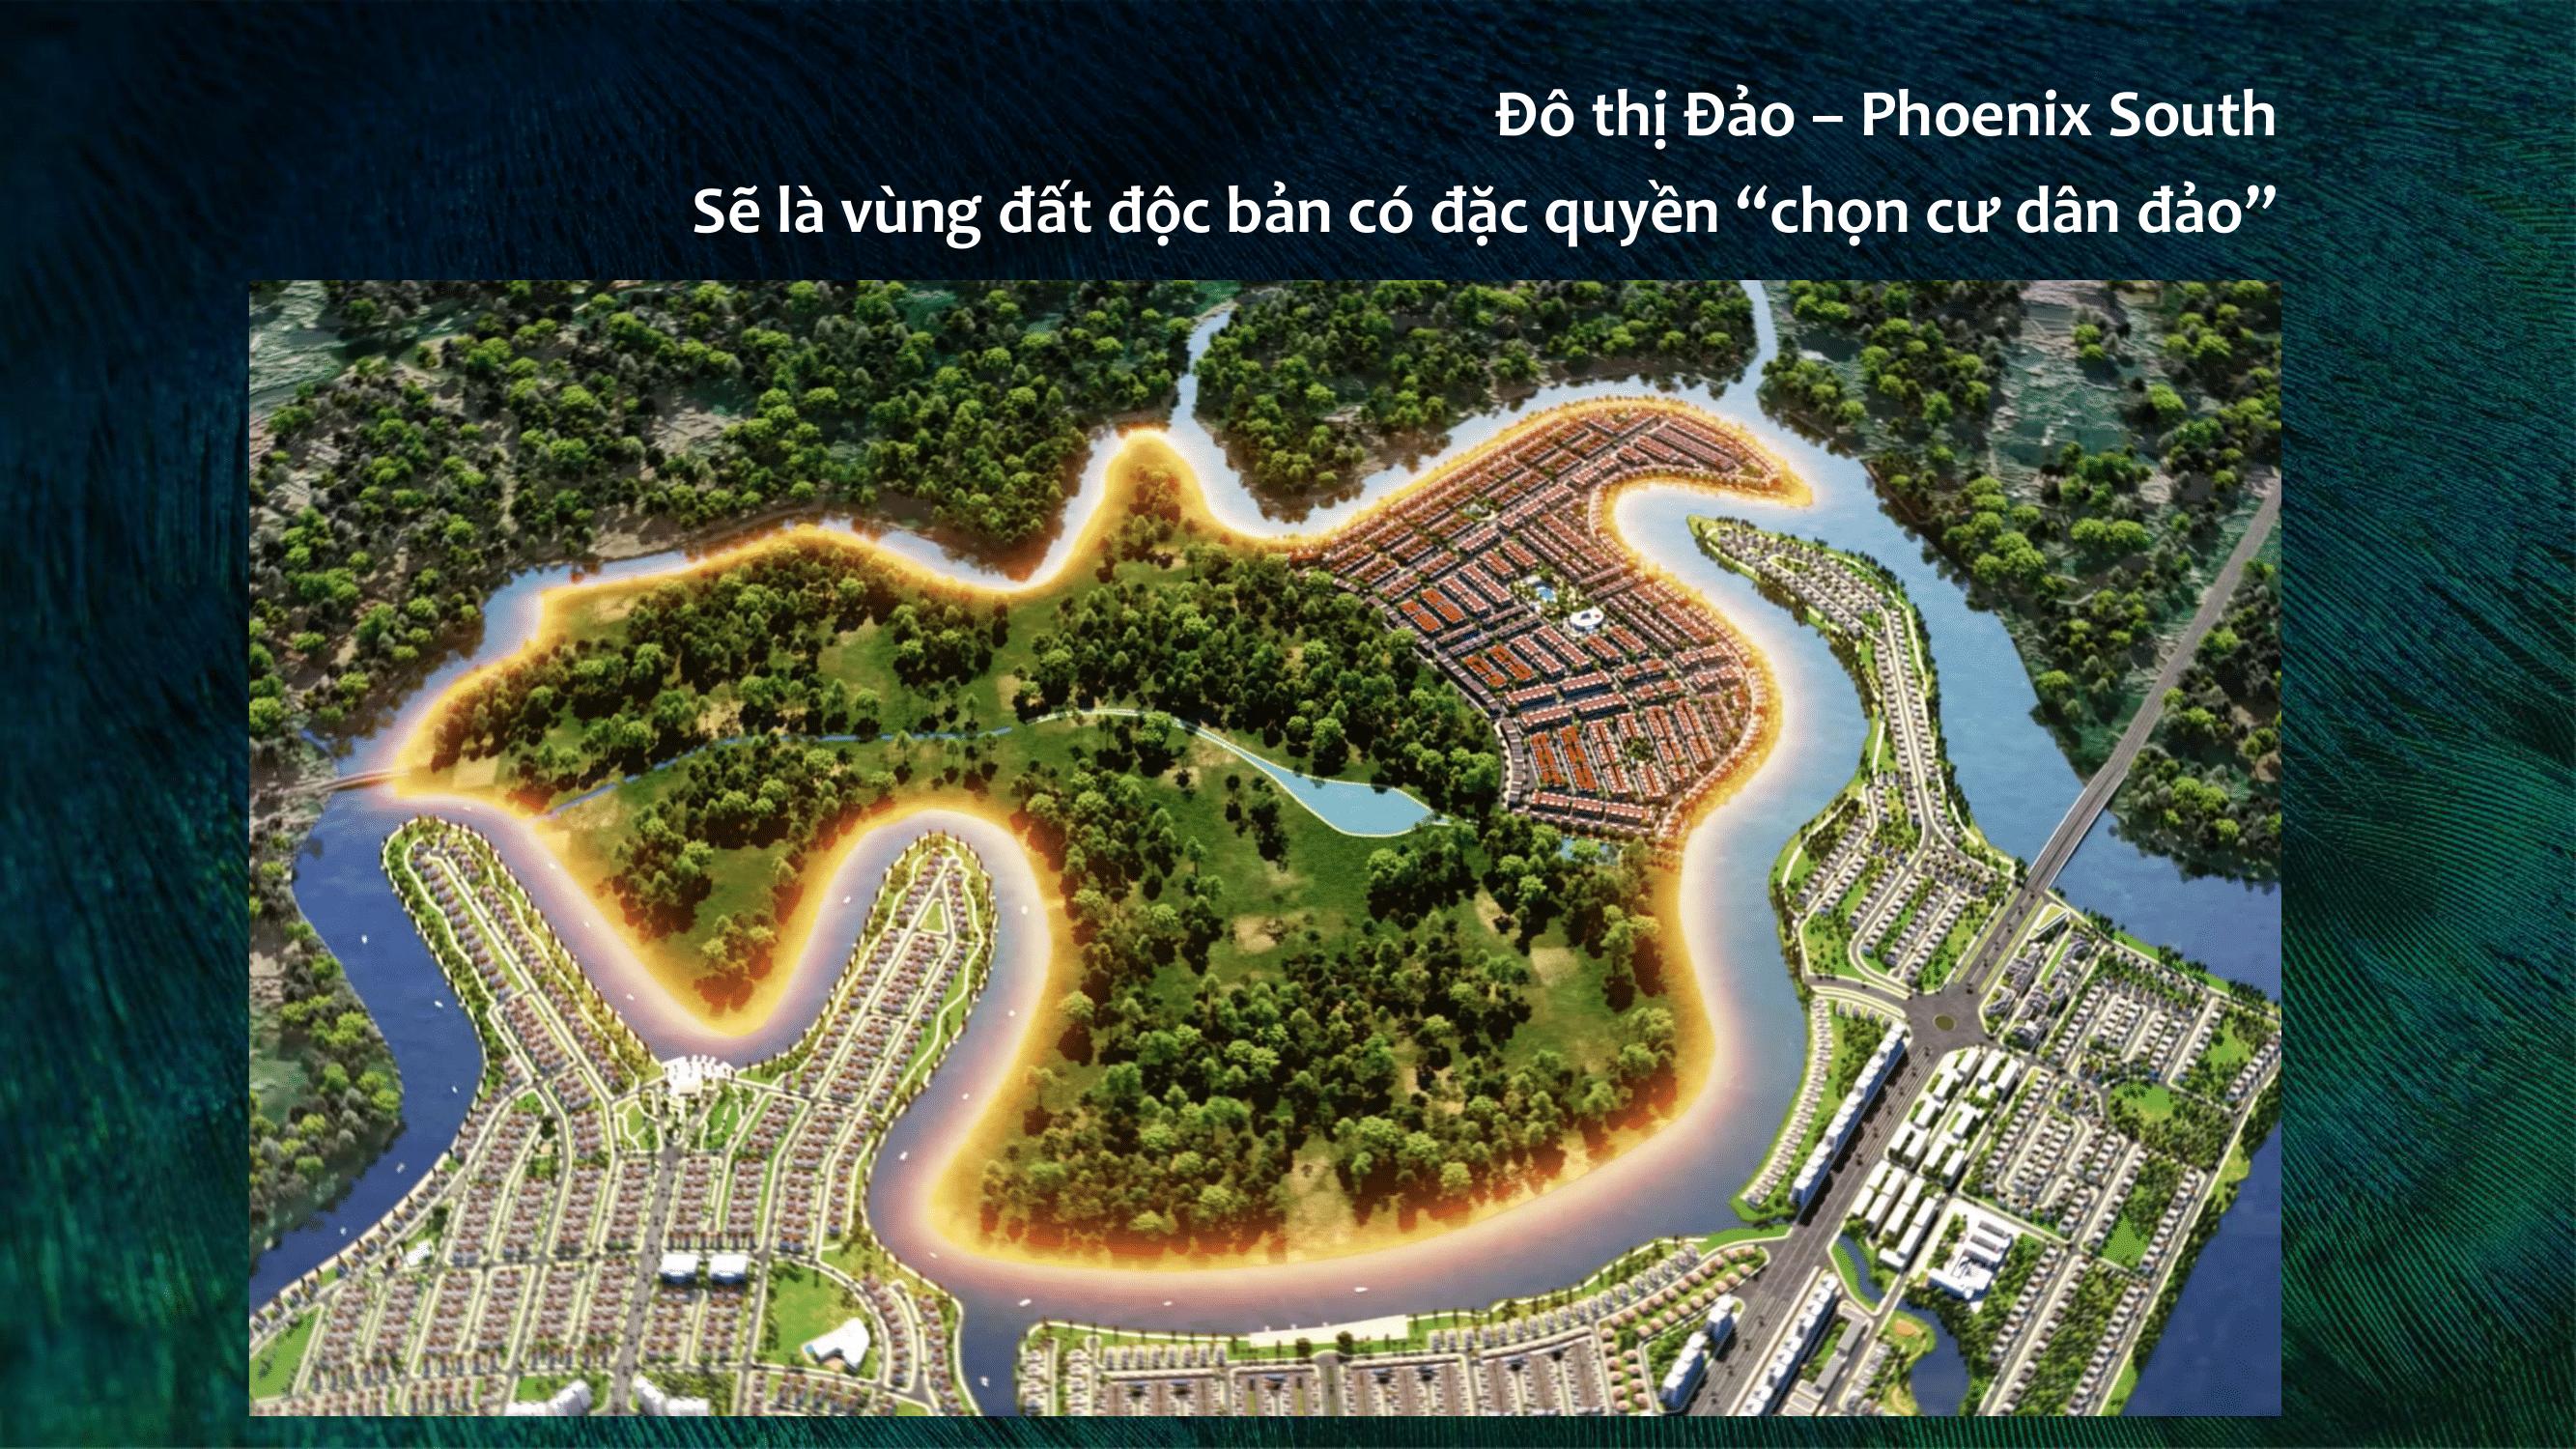 Aqua City Phan Khu Phoenix South Present 51